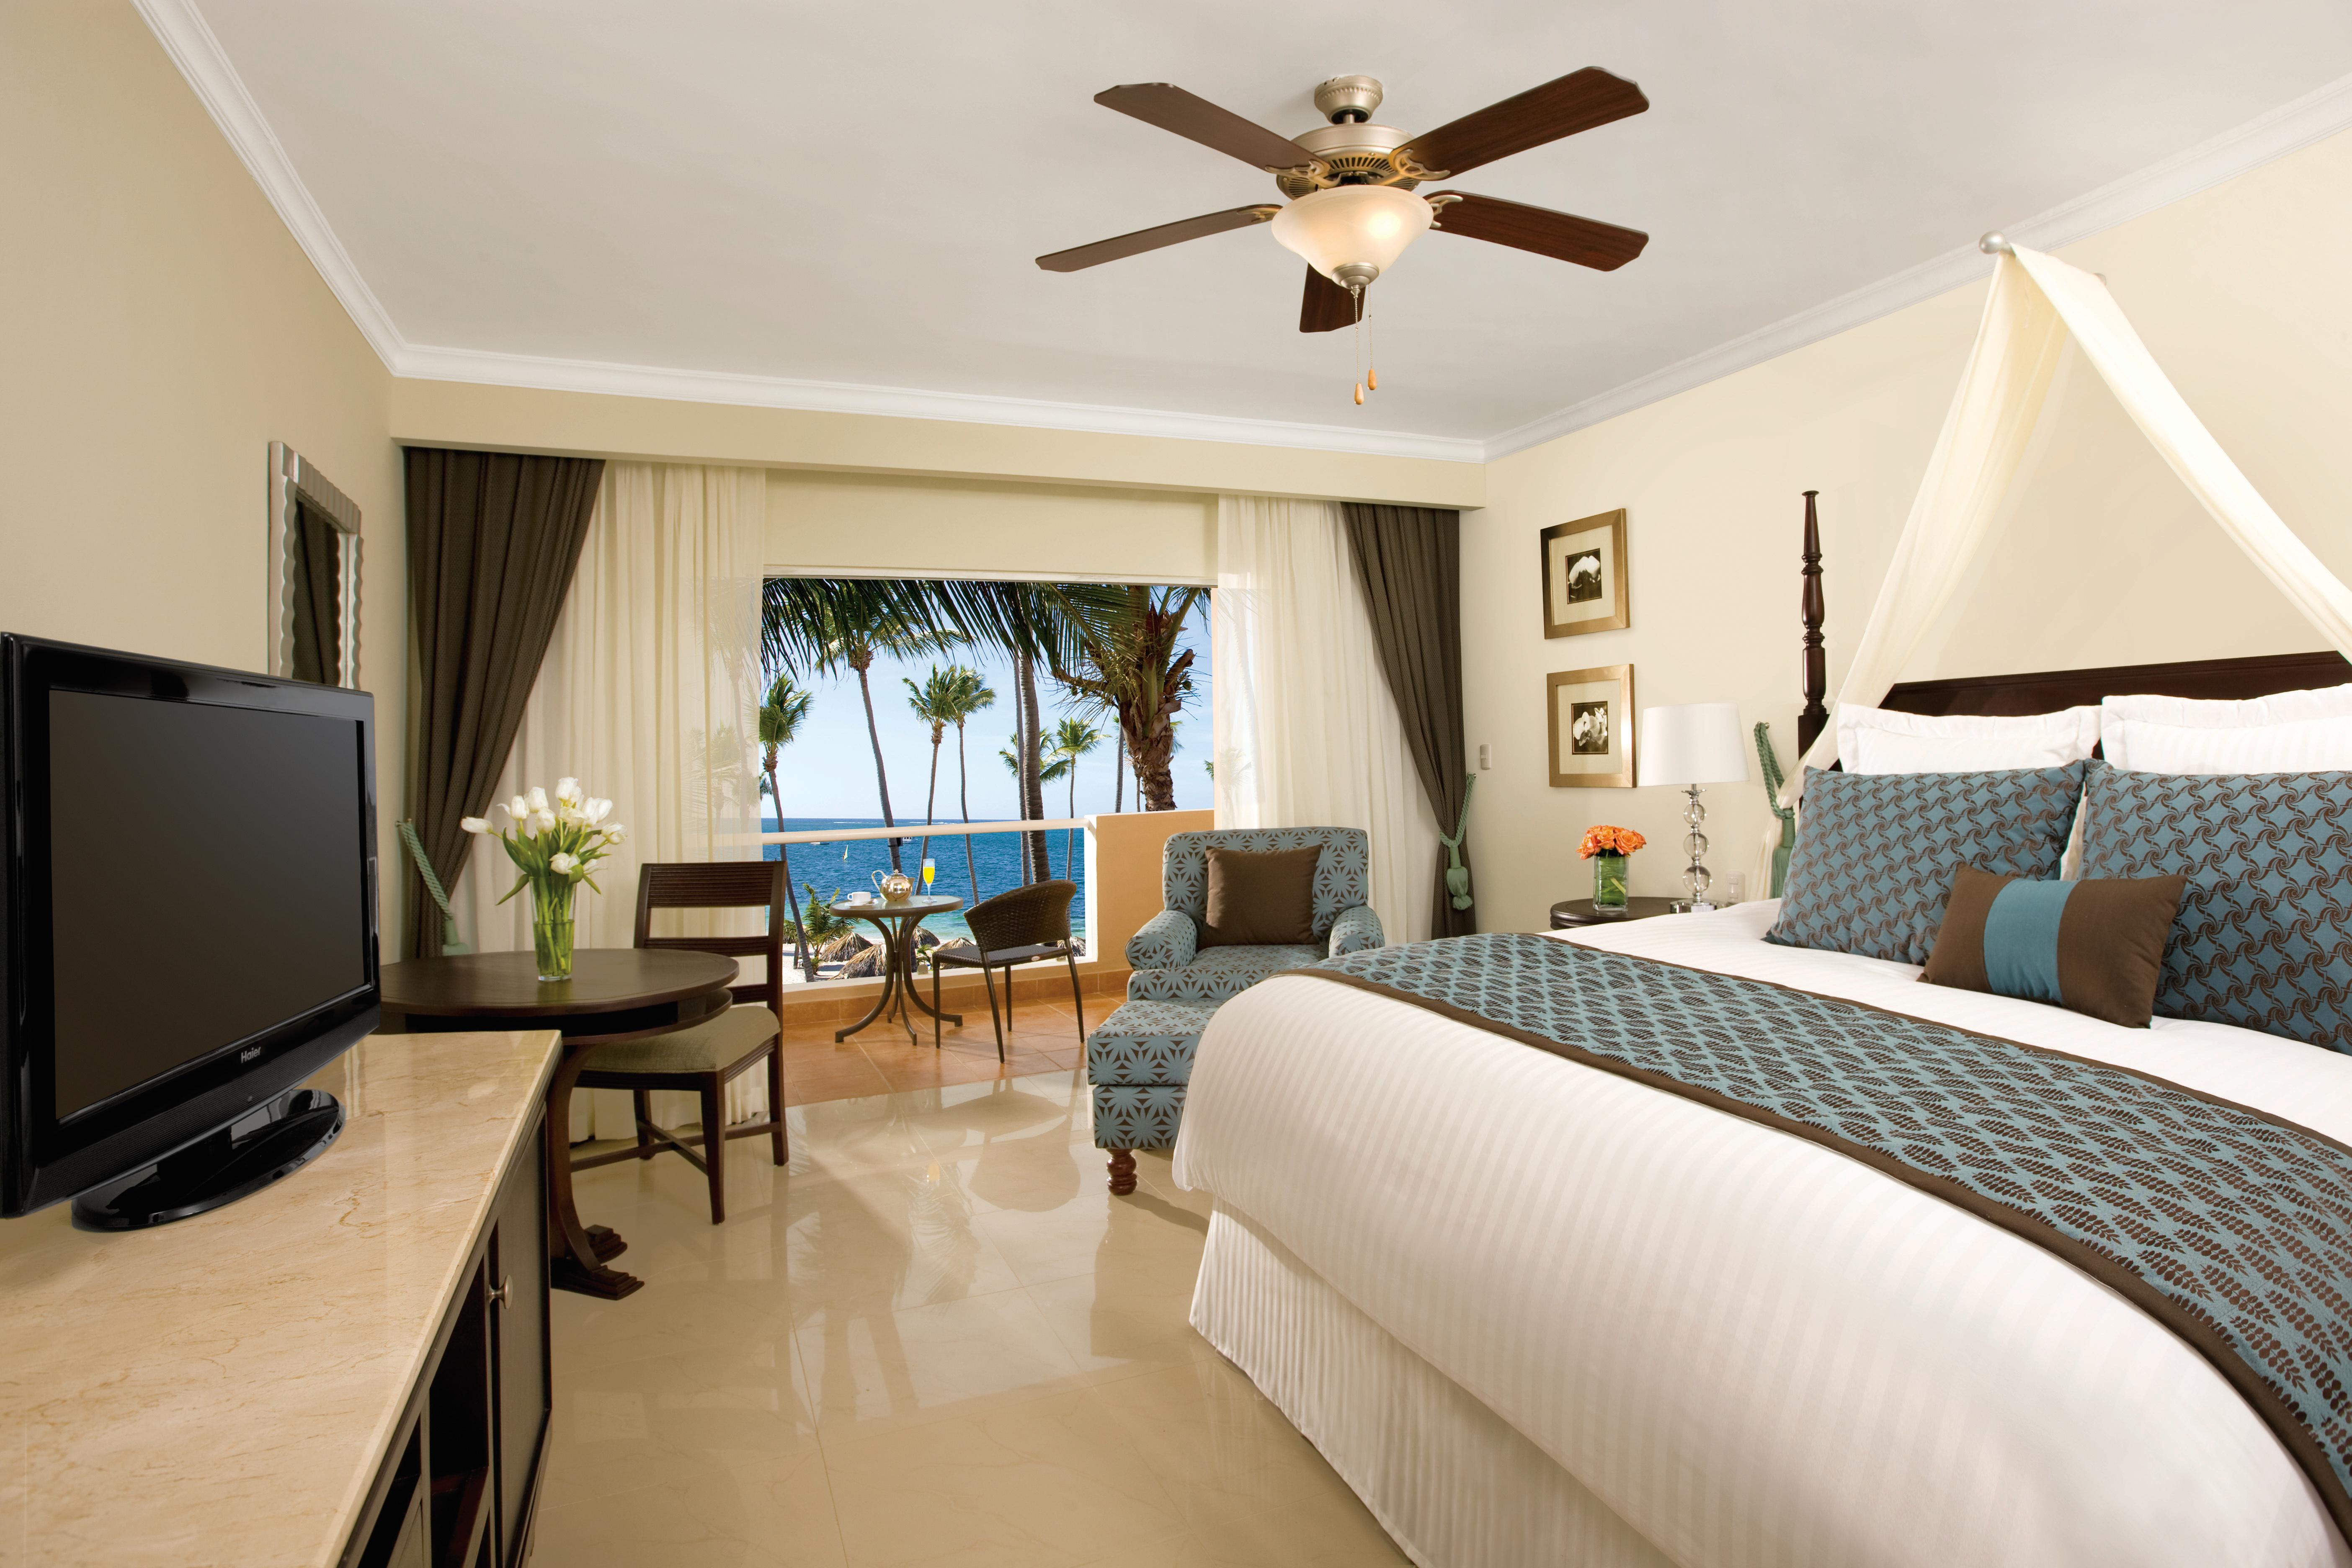 Travel Agency All-Inclusive Resort Dreams Palm Beach 26